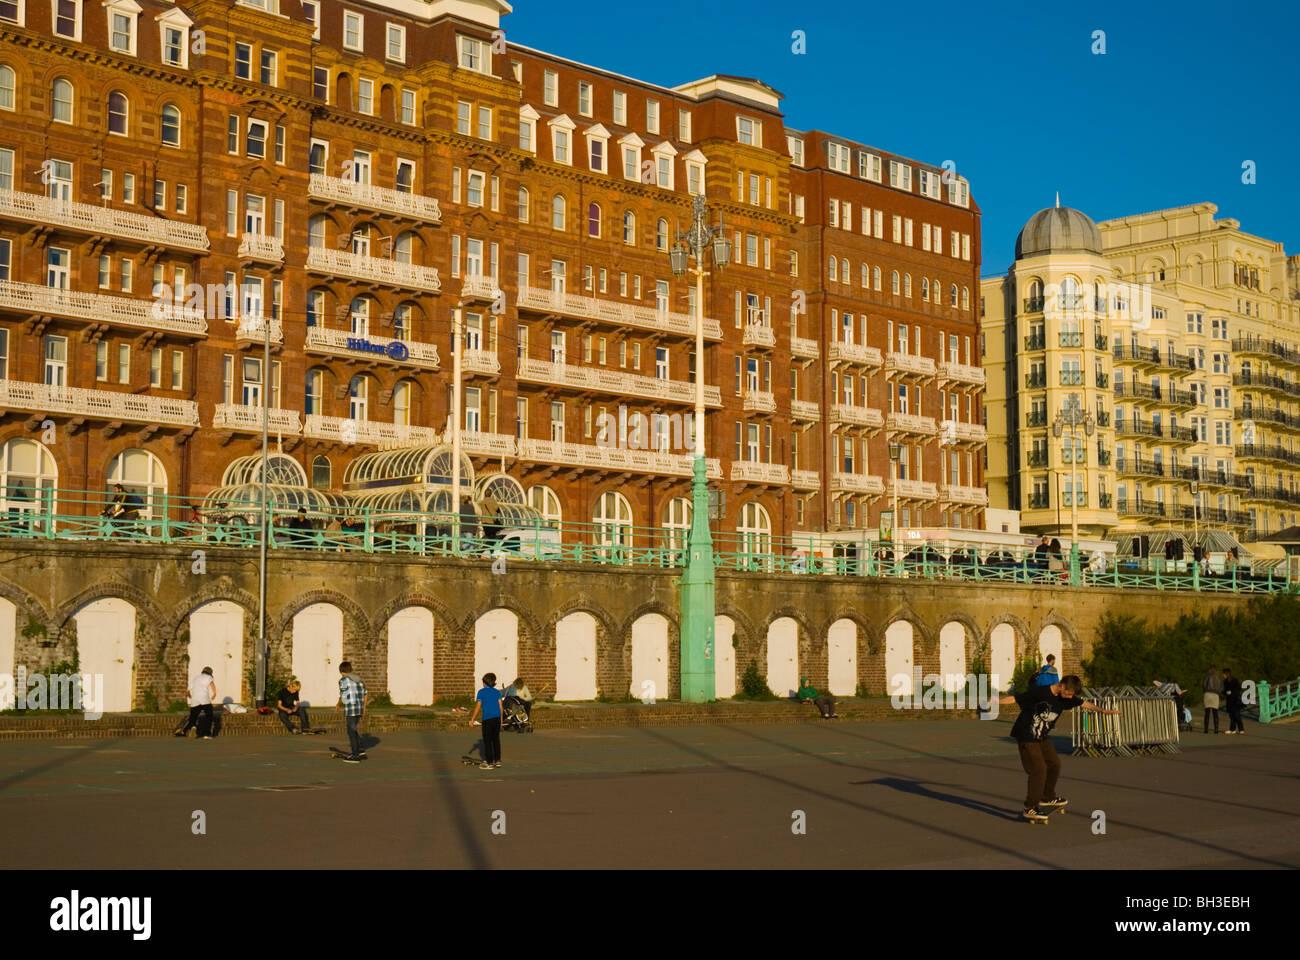 Skateboarders King's Road Arches on beachside esplanade in Brighton England UK Europe Stock Photo